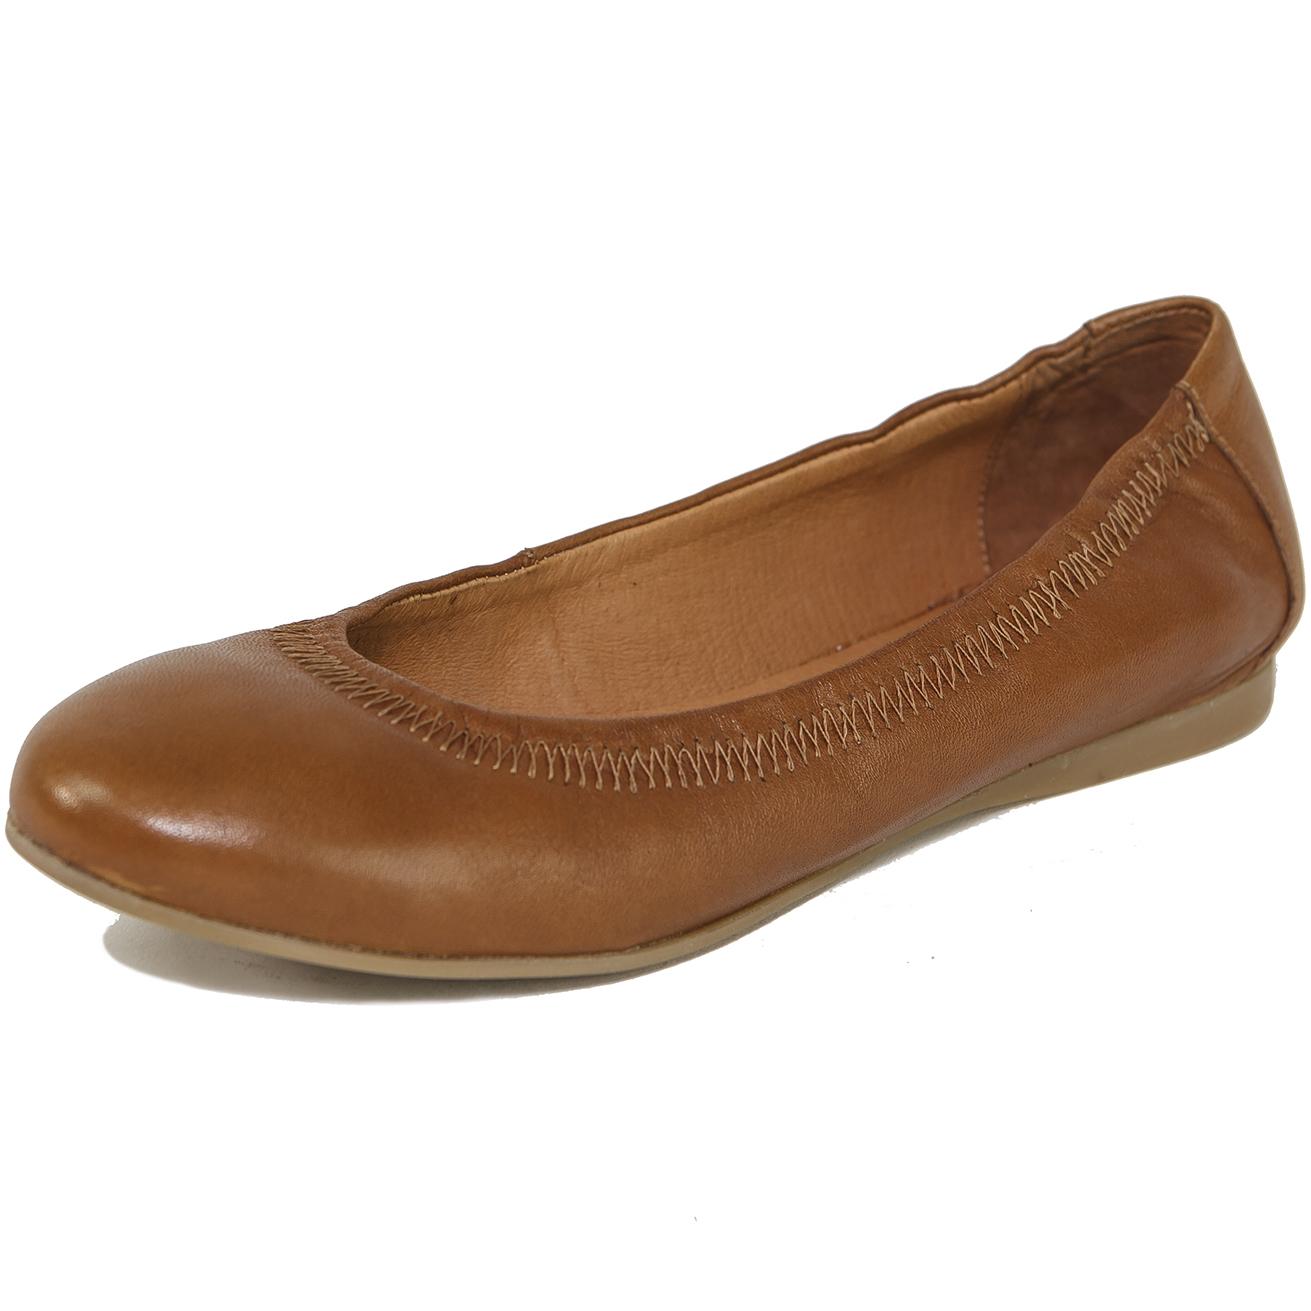 Alpine-Swiss-Women-s-Shoes-Ballet-Flats-Genuine-